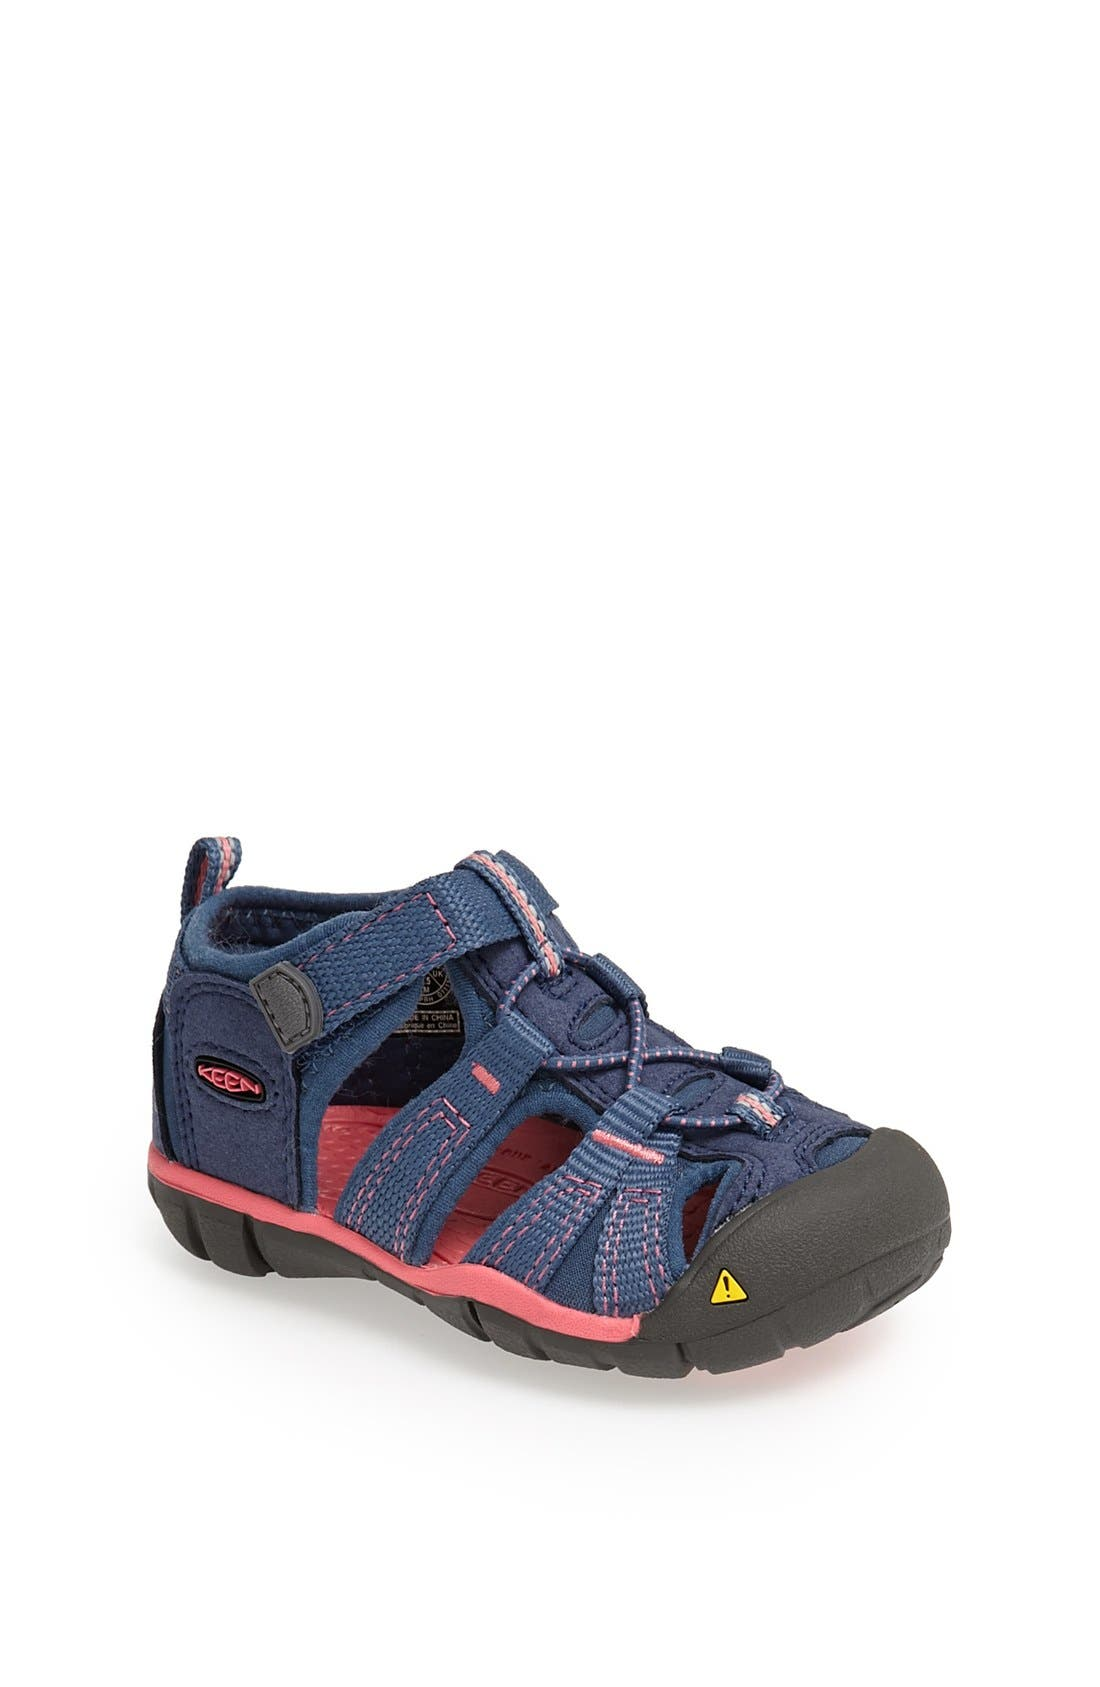 'Seacamp II' Waterproof Sandal,                             Main thumbnail 1, color,                             415